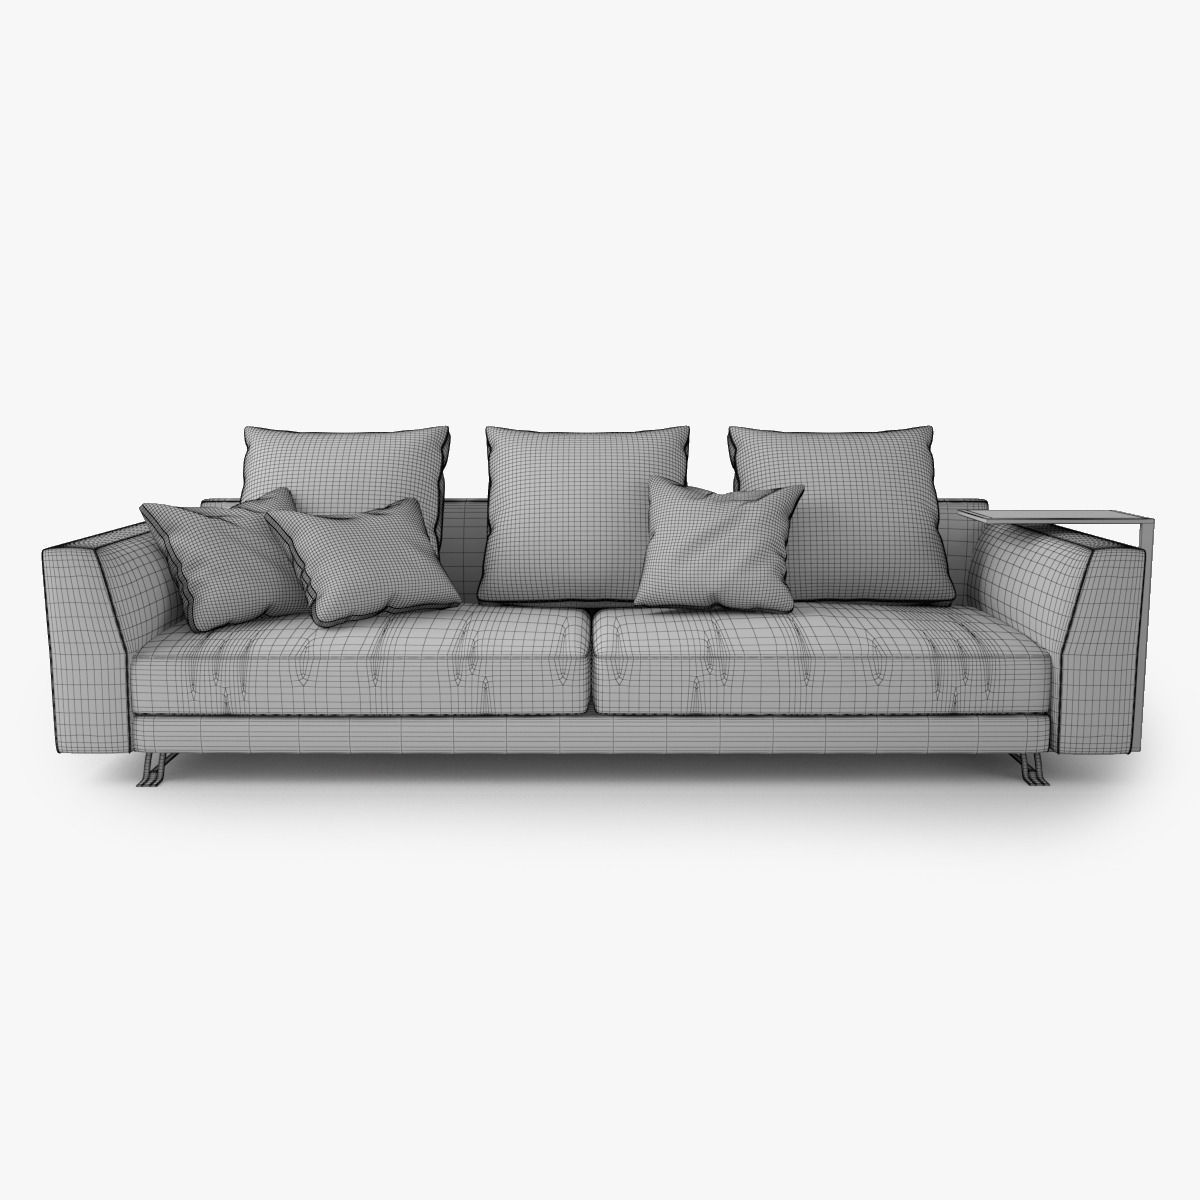 Burton Leather Sofa: Busnelli Burton Sofa 3D Model .max .obj .fbx